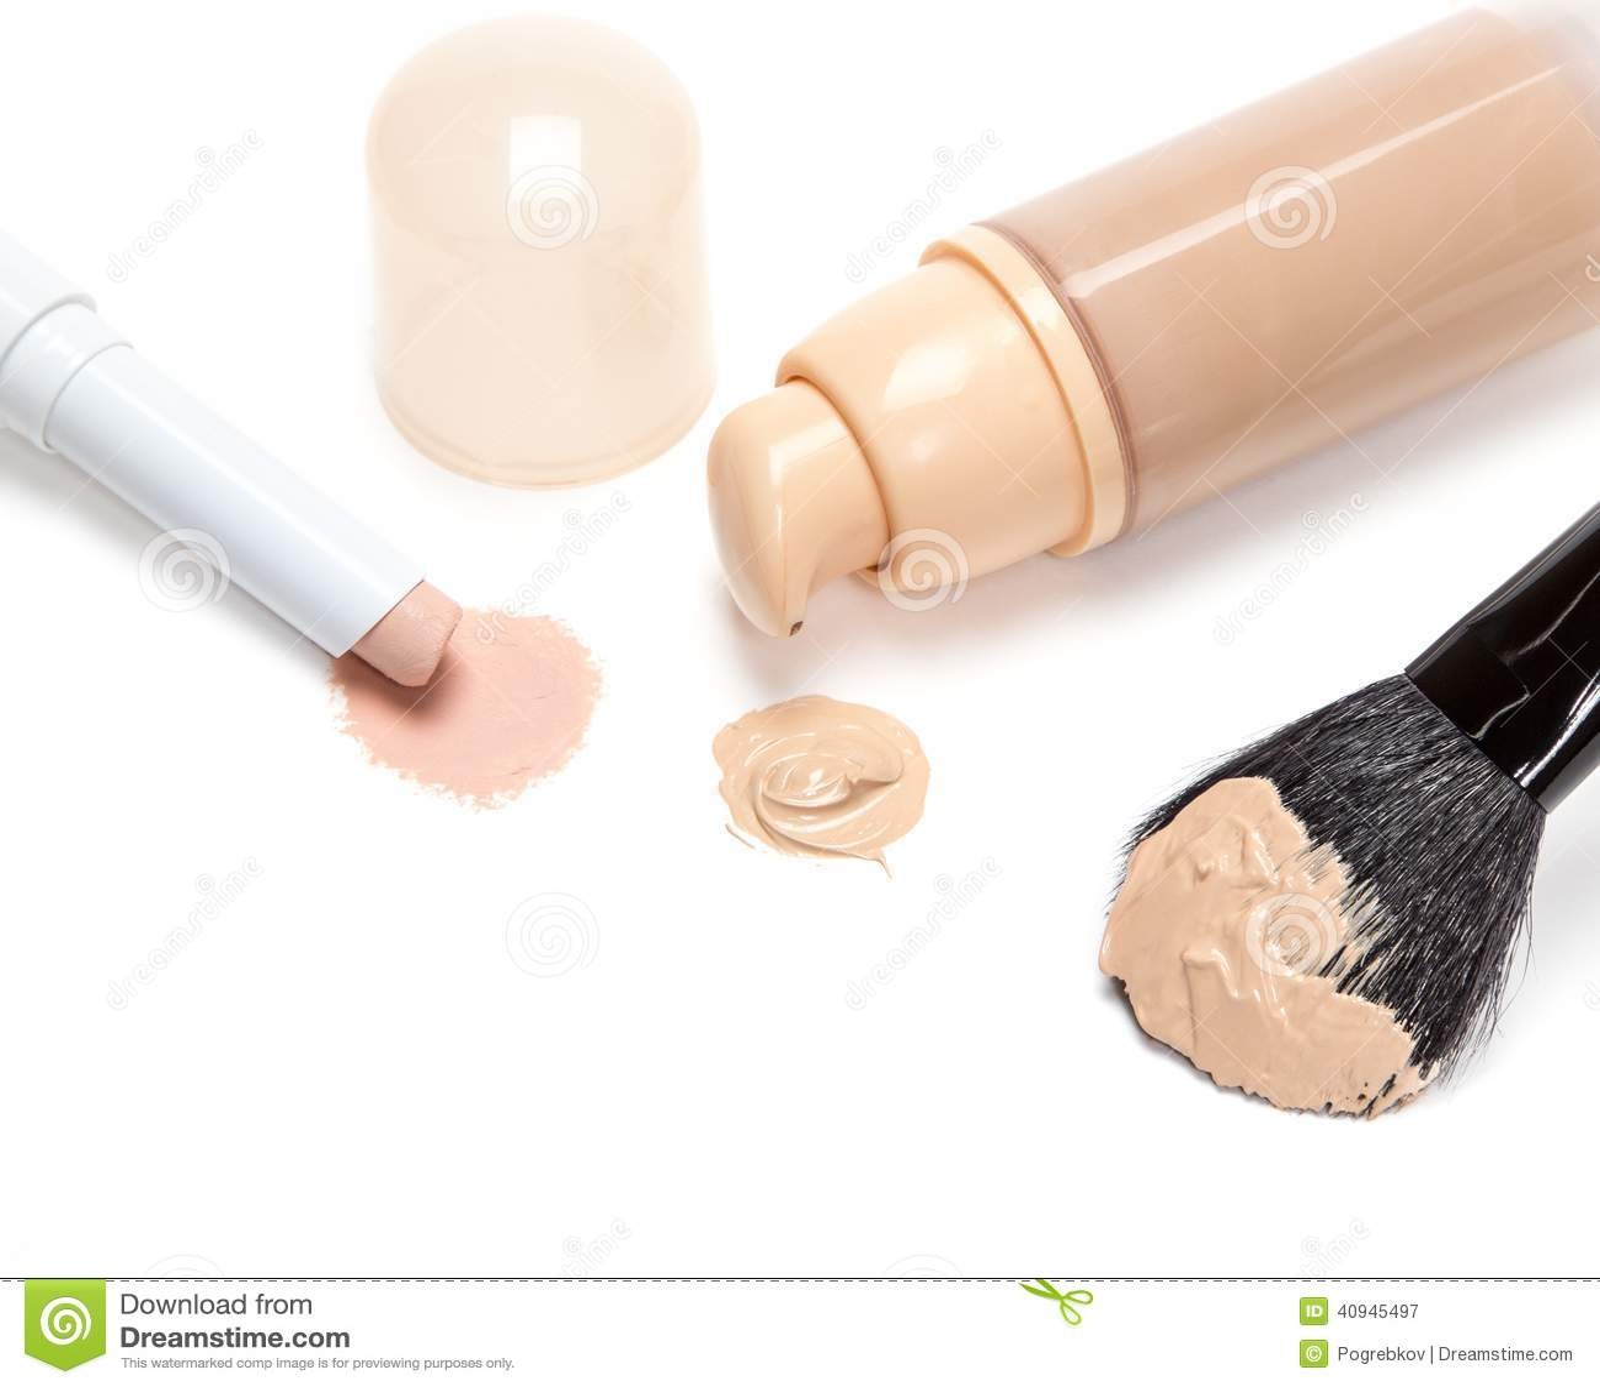 corrector en lapiz maquillaje